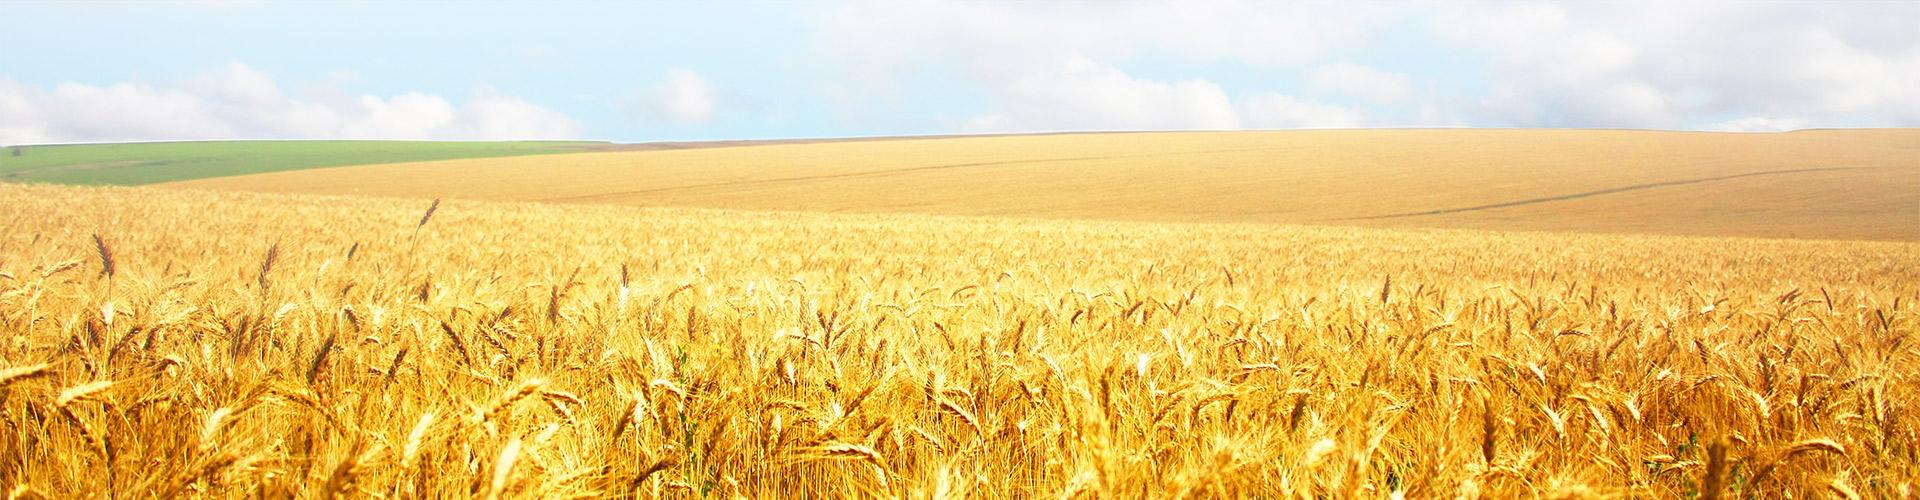 canada crops banner